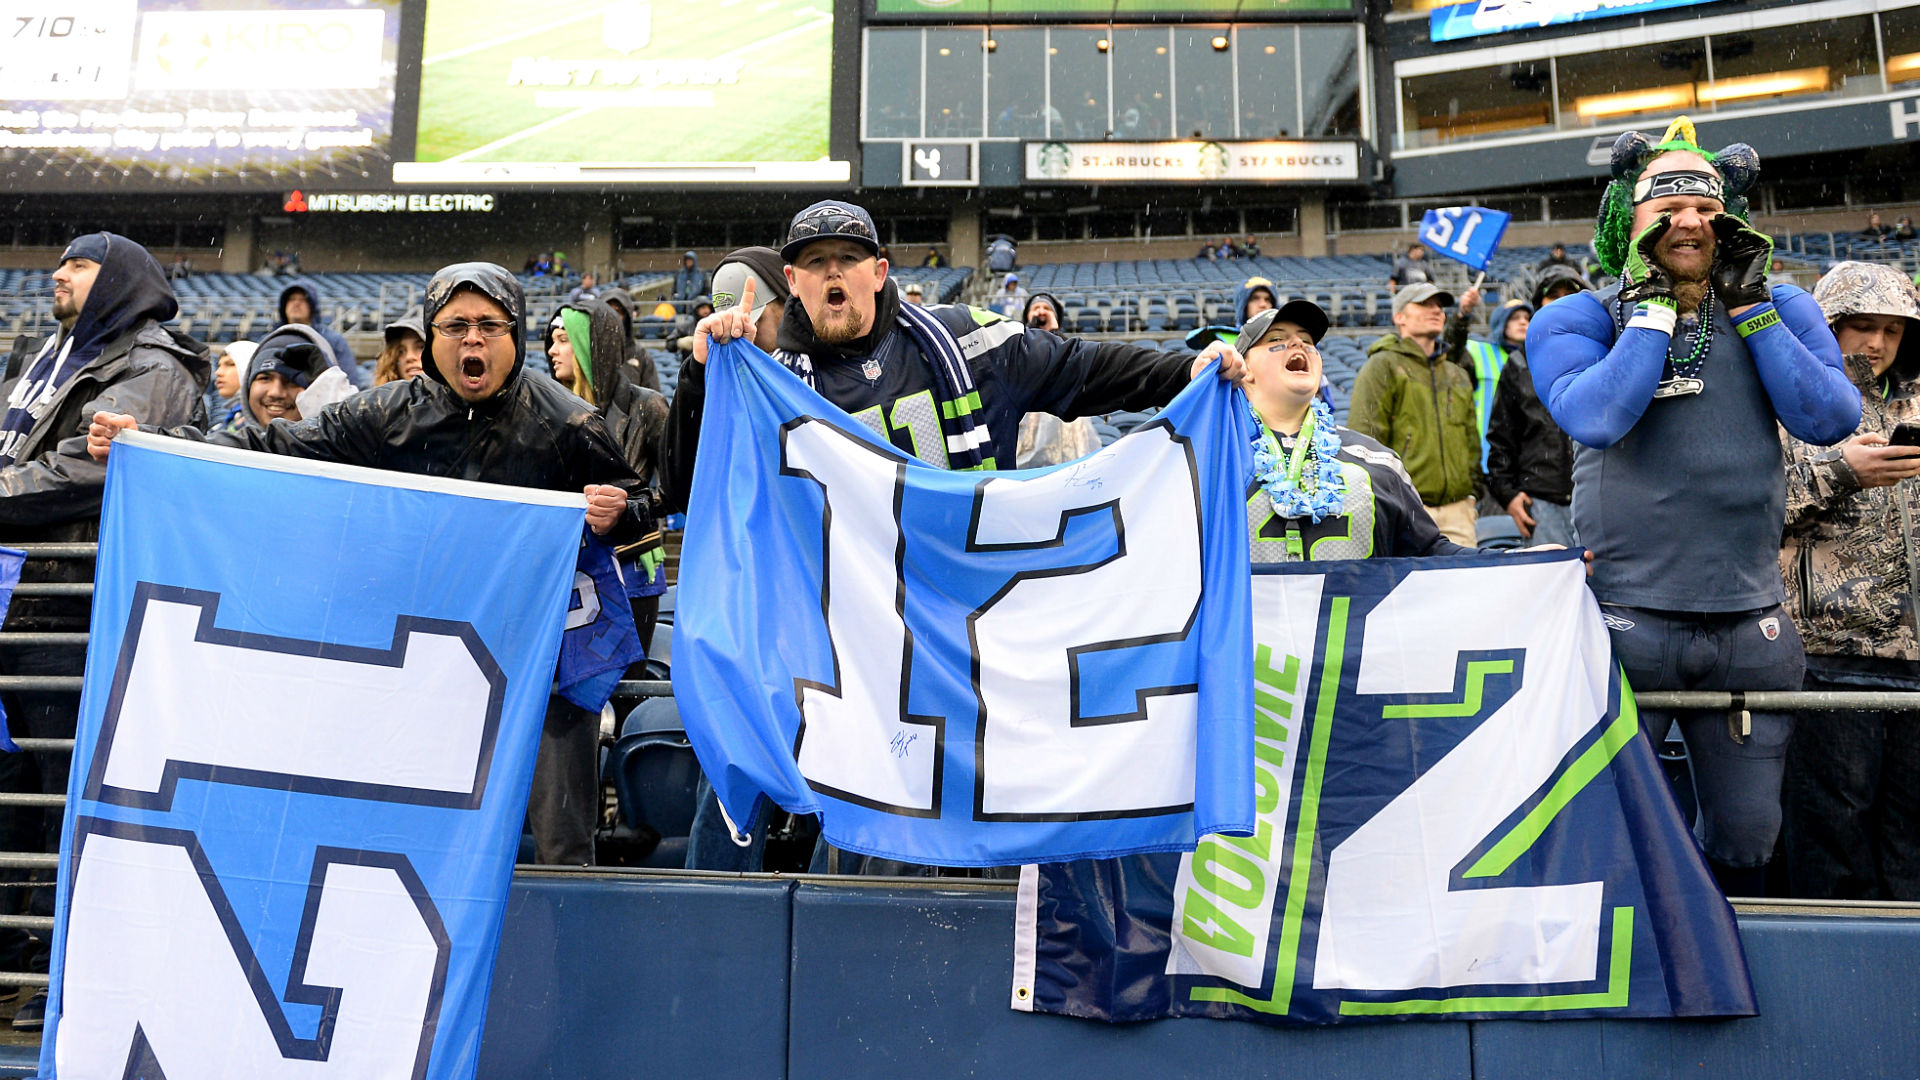 Seattle Seahawks Centurylink Field Drops 12th Man Designation